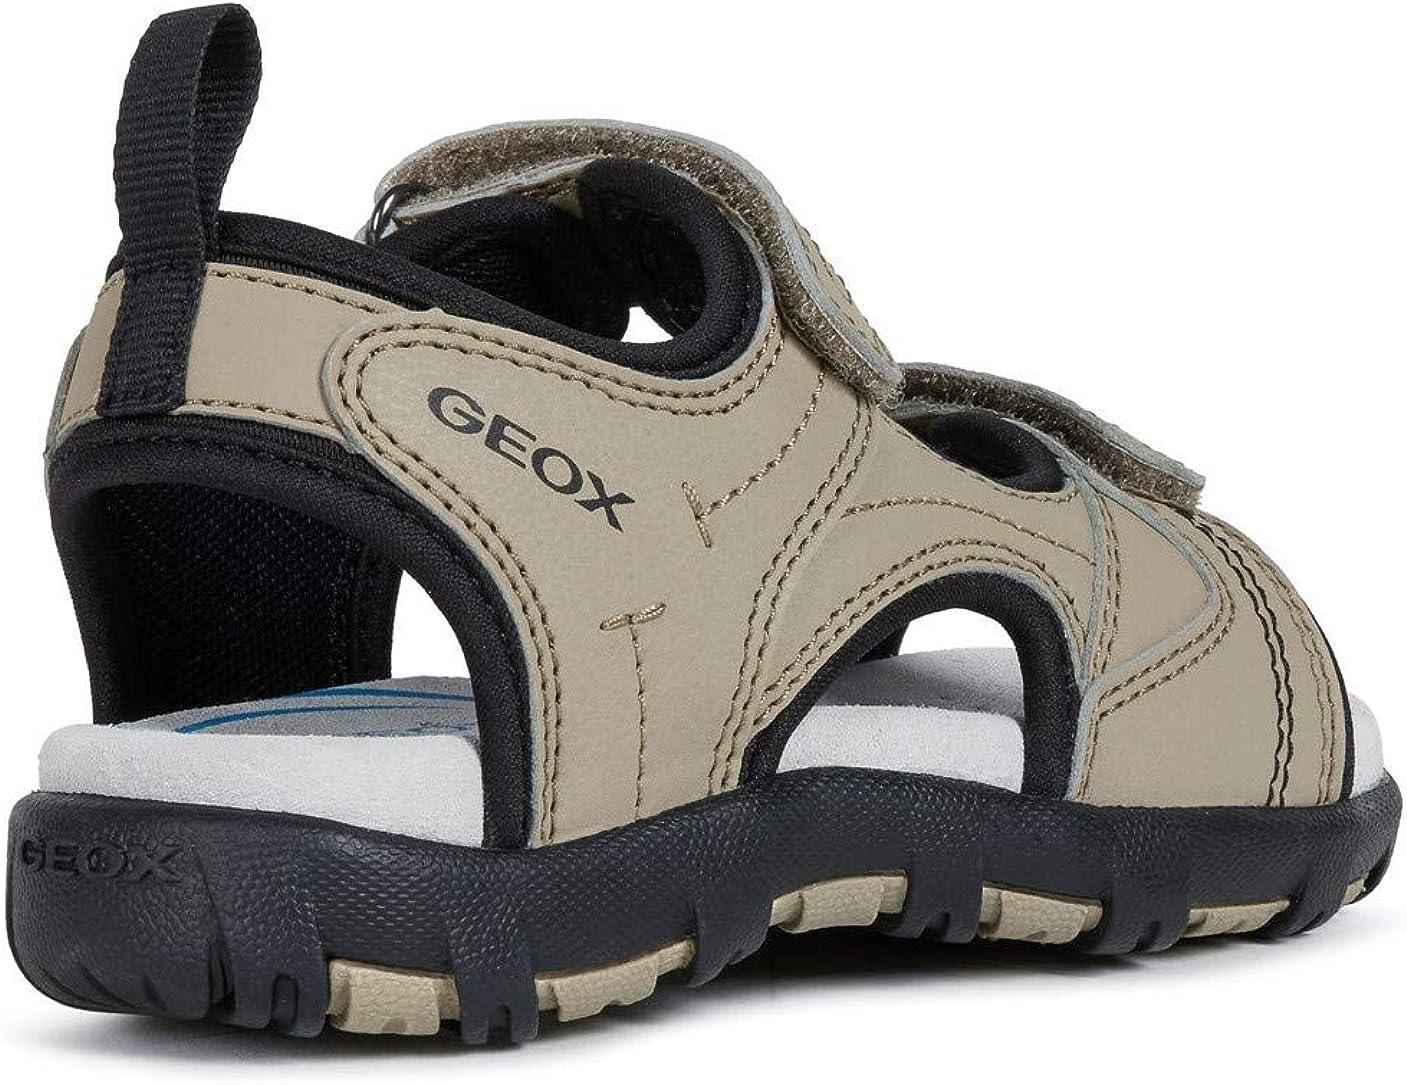 Geox Mixte Enfant Sandales JR Sandal Pianeta Fille,Garcon Sandales